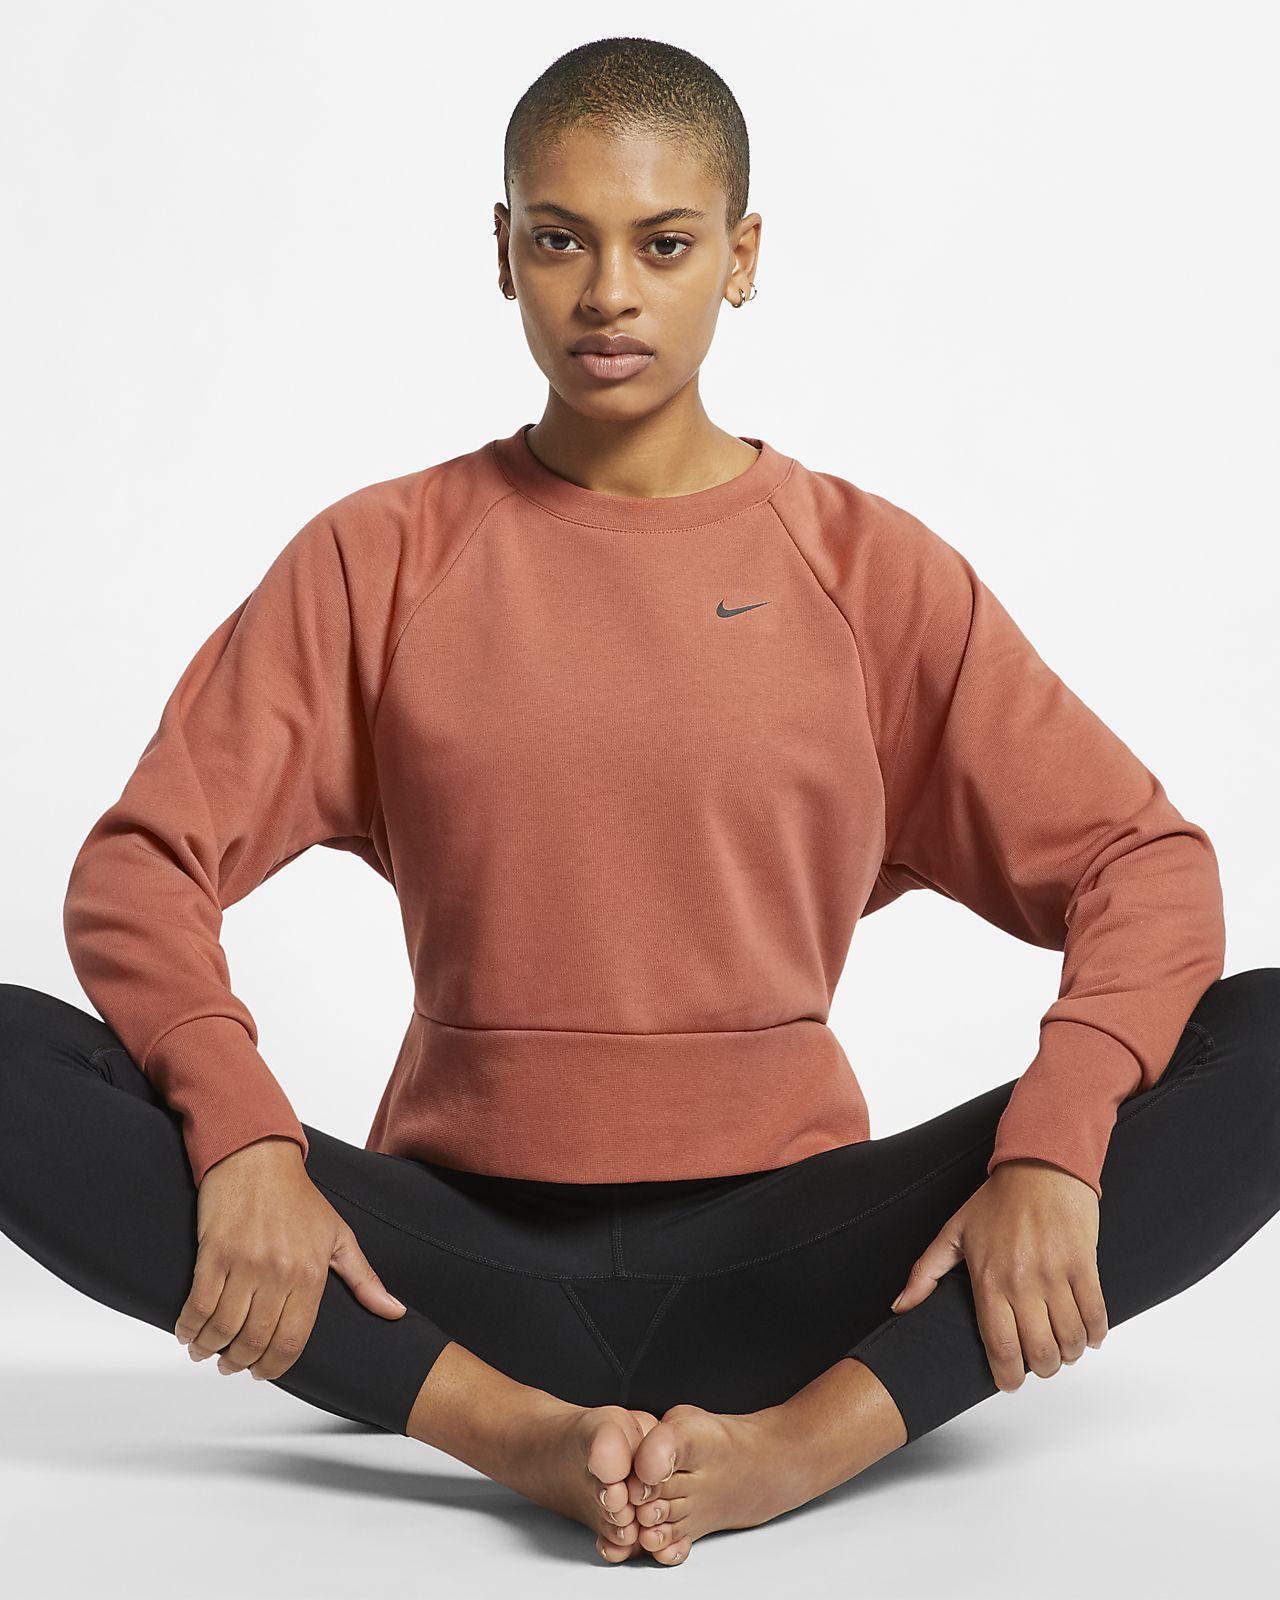 Camisola de ioga de manga comprida Nike Dri-FIT para mulher